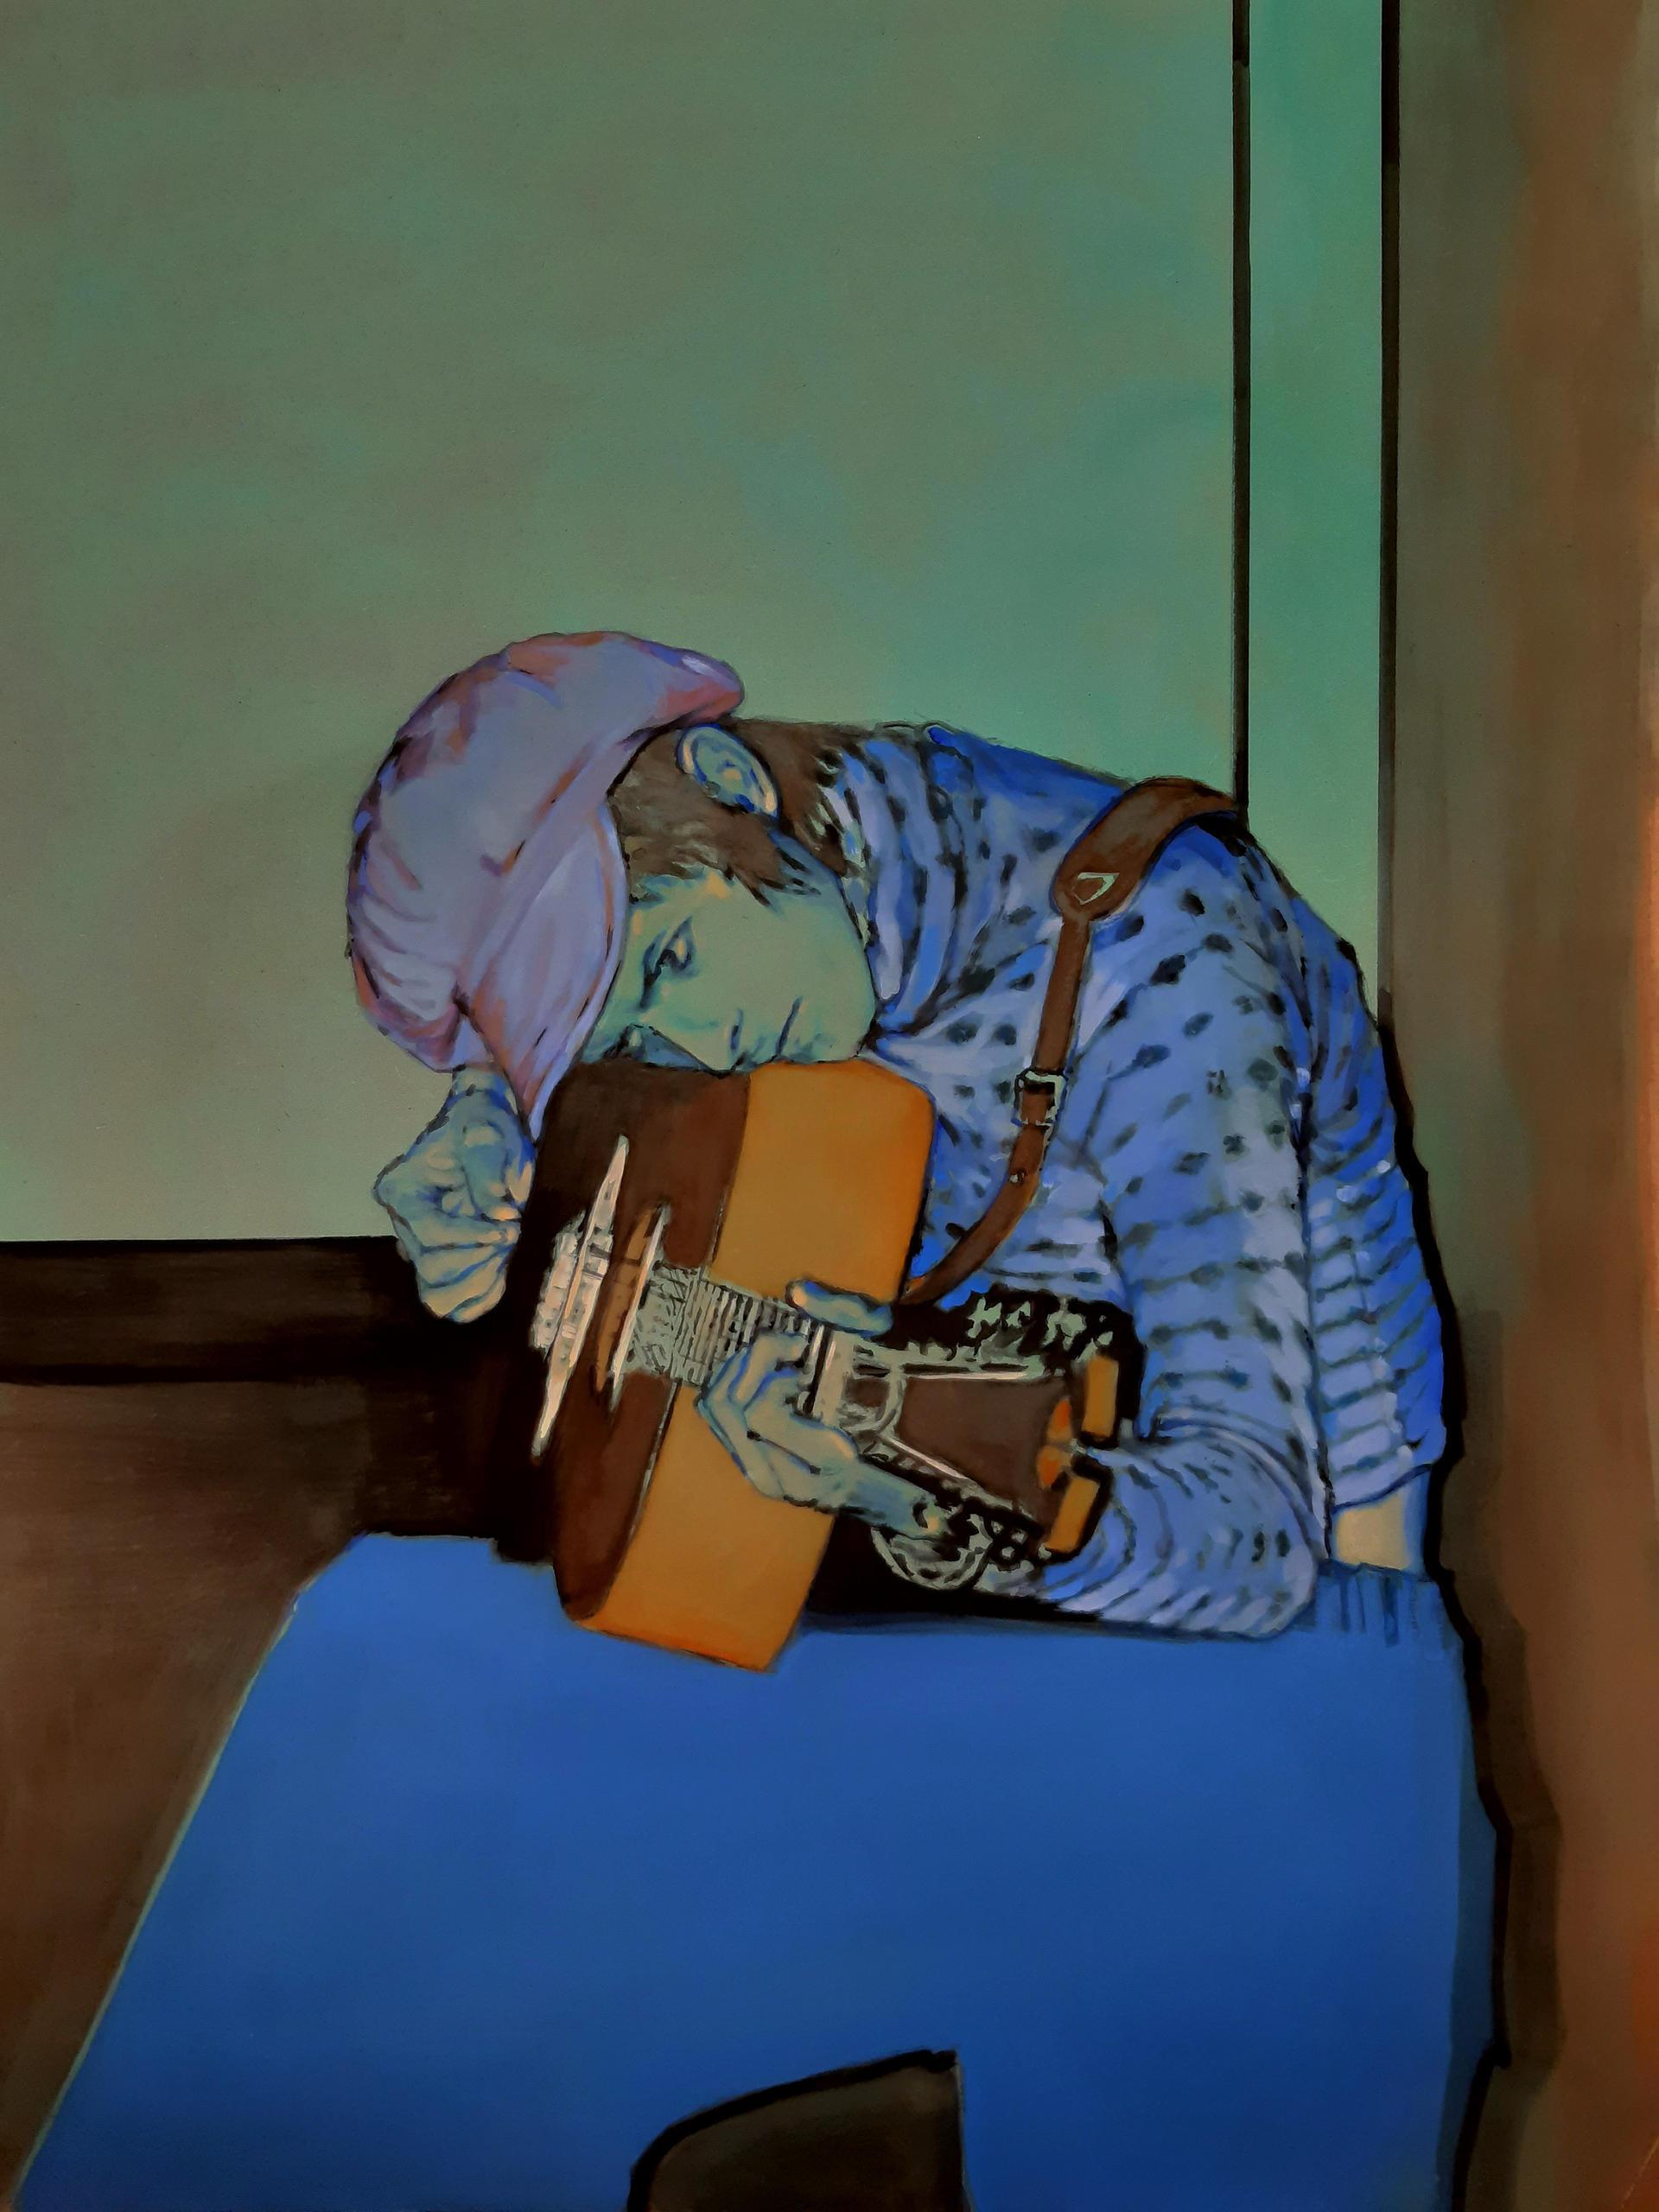 THE BLUE GUITARIST